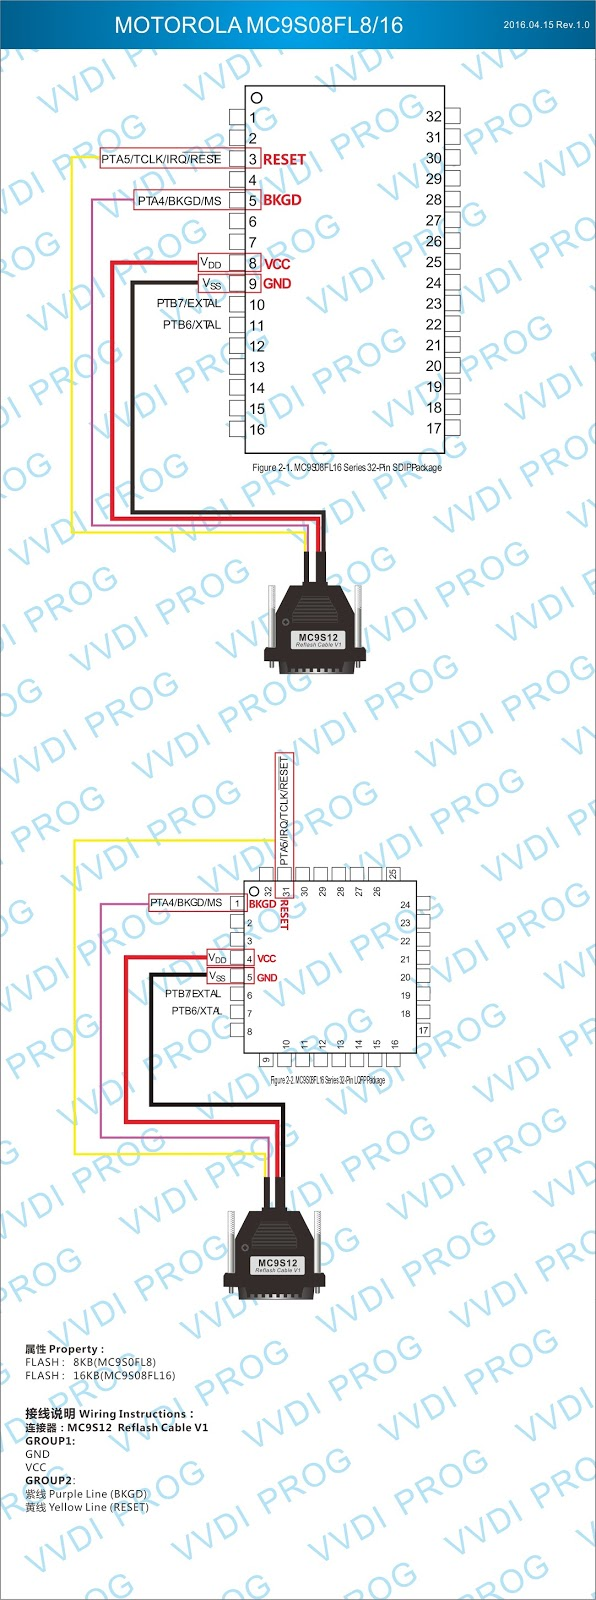 Xhorse Vvdi Prog Wiring Diagram To Ecus Mcus Updating Obd365com Mercedes Benz W220 Renault Laguna Bcm 2010 1l15y